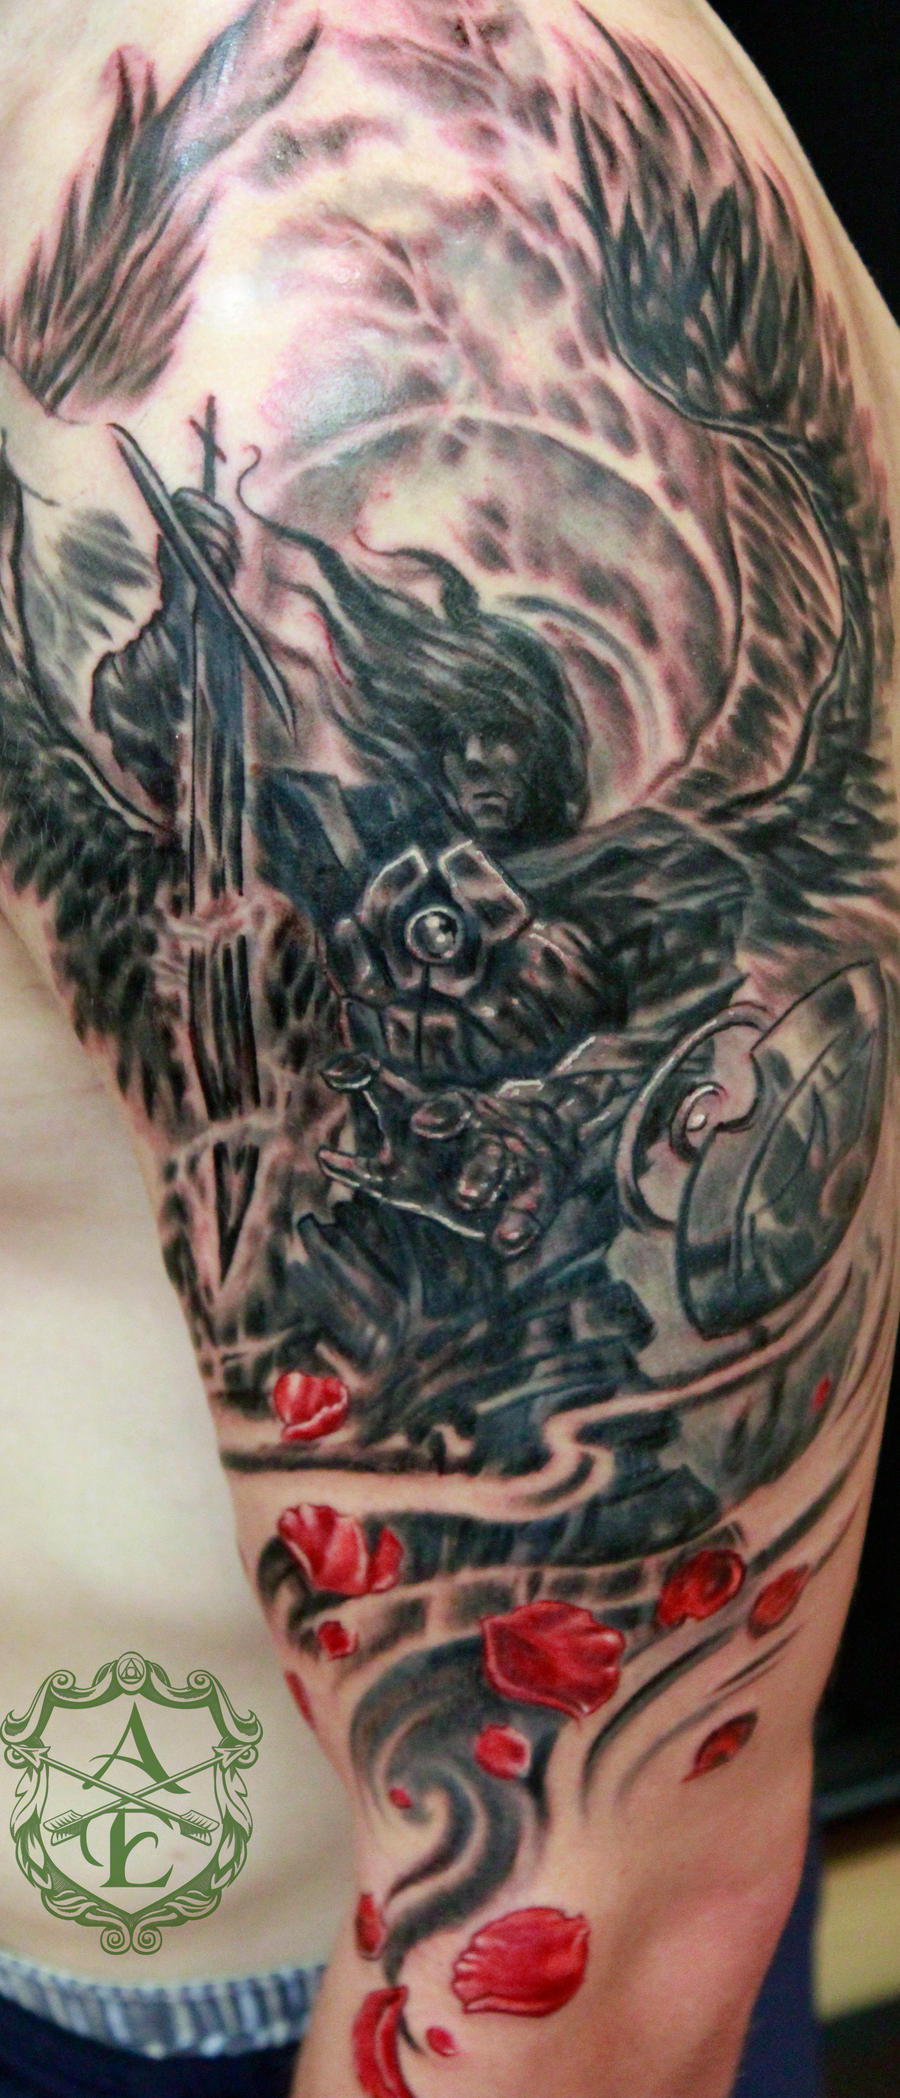 Archangel Michael Tattoos: Archangel Michael Tattoo Done By Sean Ambrose By